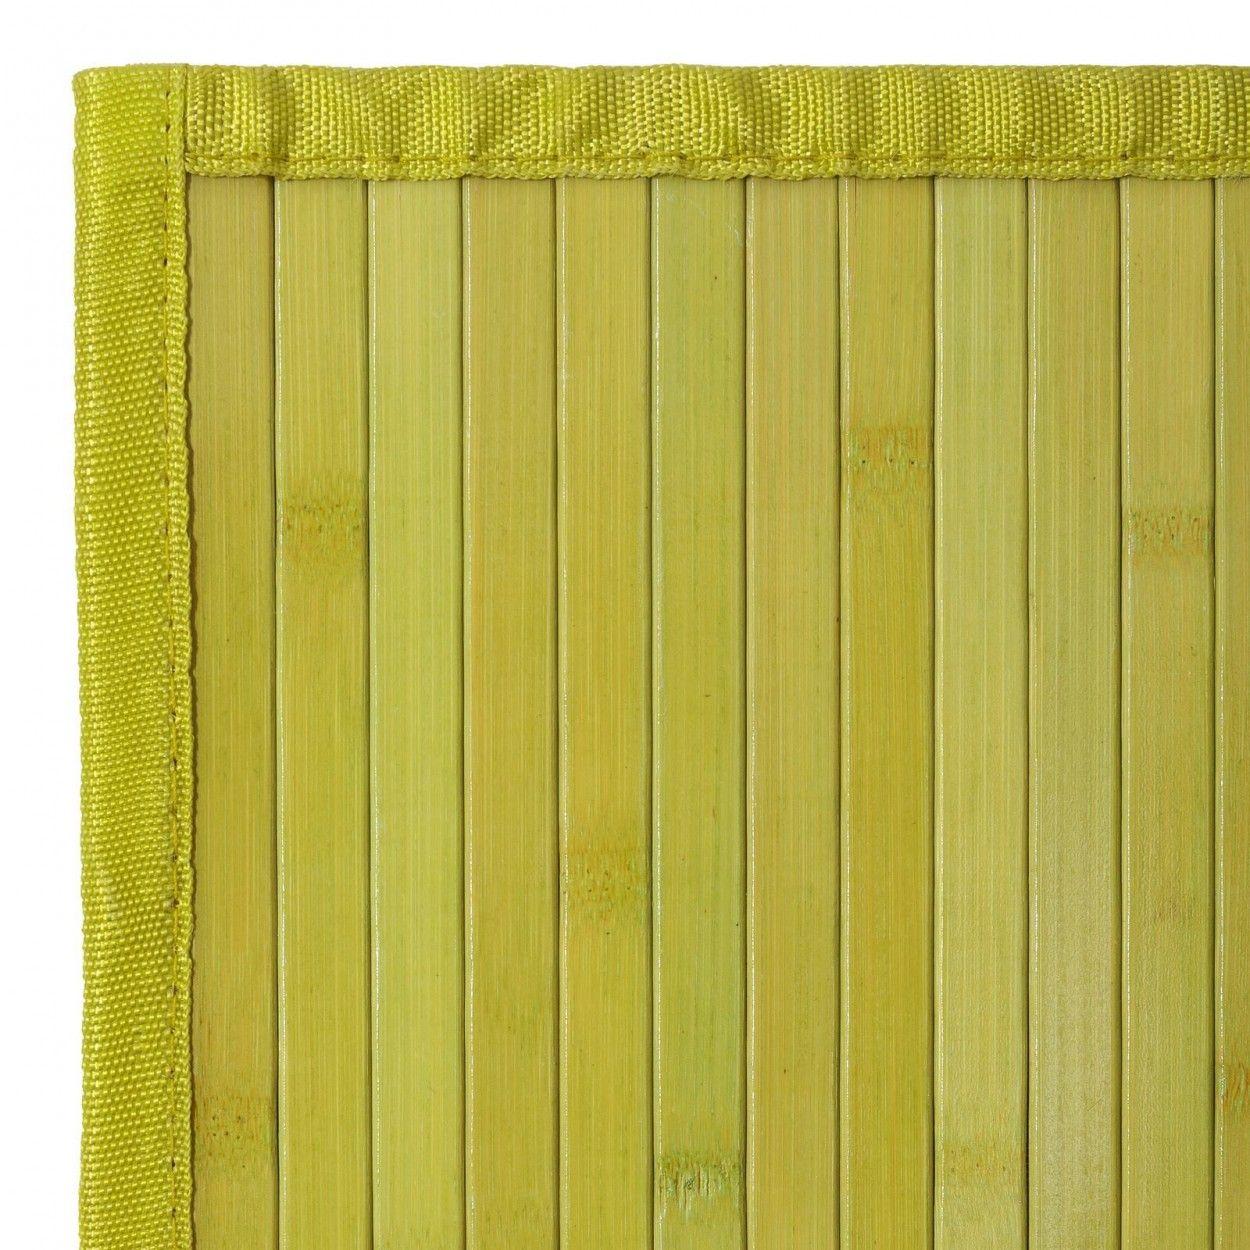 Comprar alfombra de bamb de color verde para pasillo hogar y m s - Alfombra de bambu ...